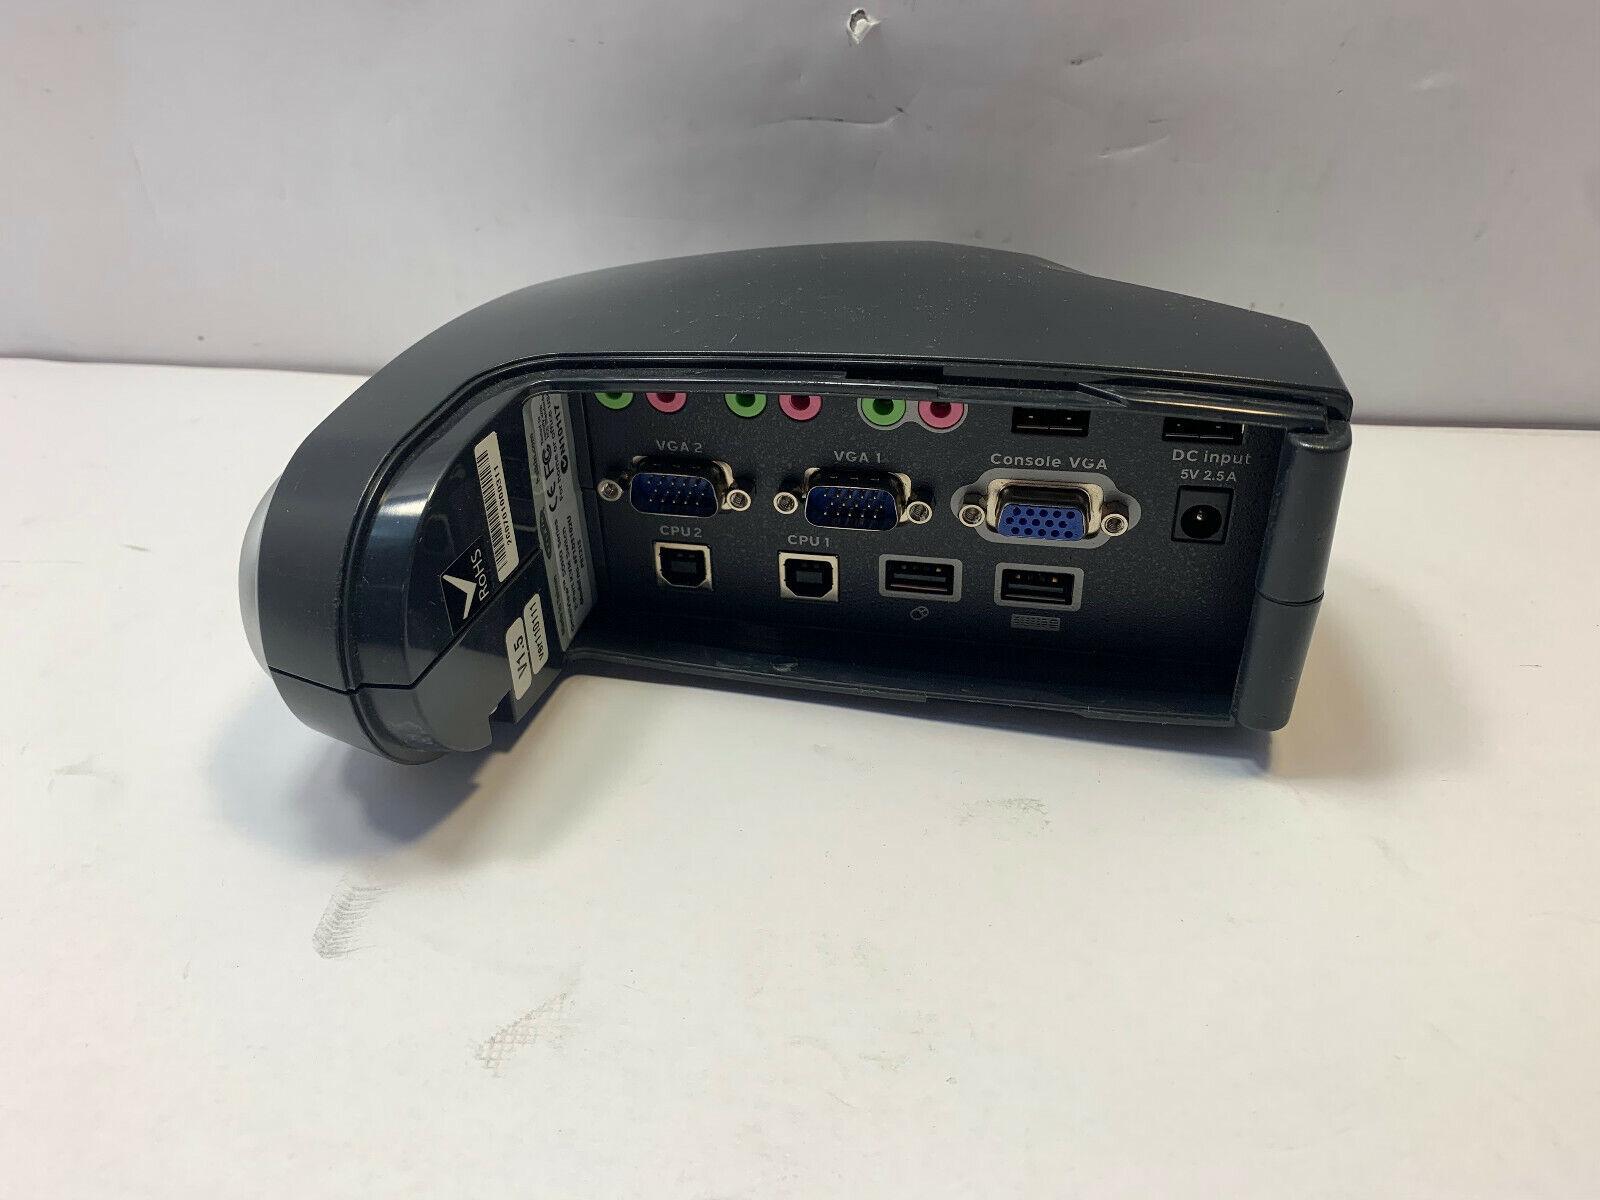 Belkin OmniView SOHO Series 2 Port KVM Switch F1DS102U P81215 V1.5 RoHS 5V 2.5A